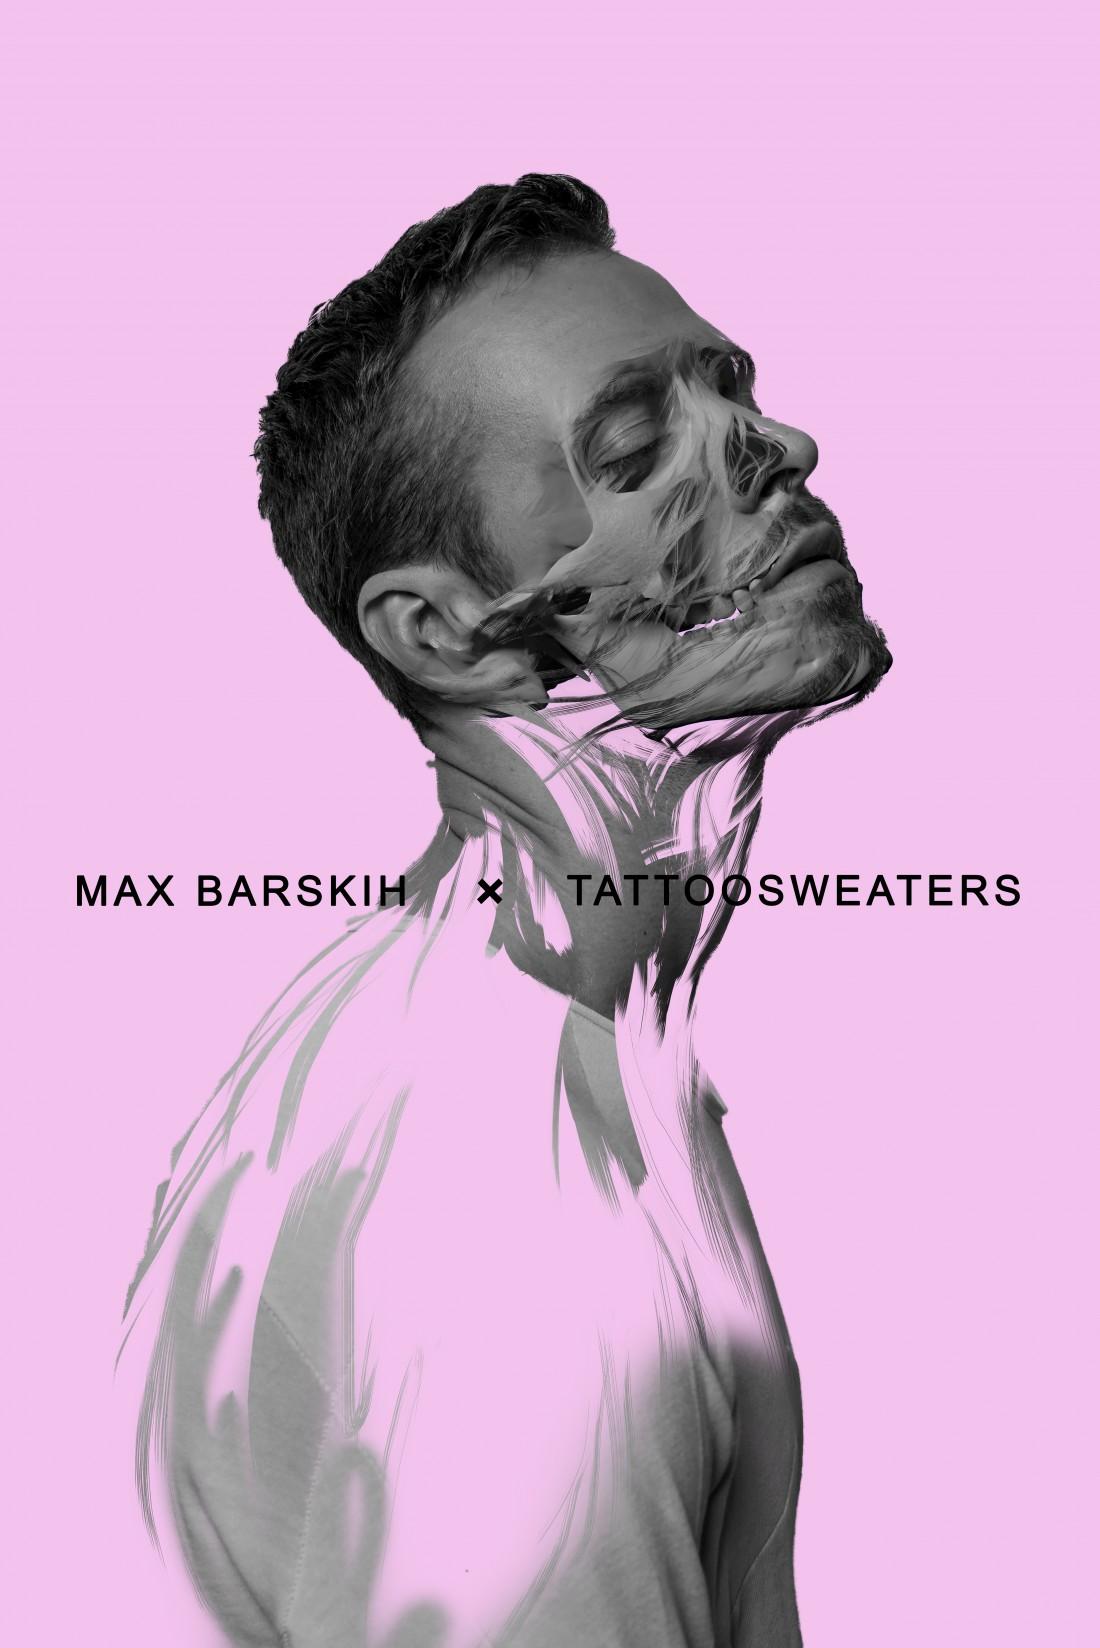 Макс Барских стал лицом модного бренда